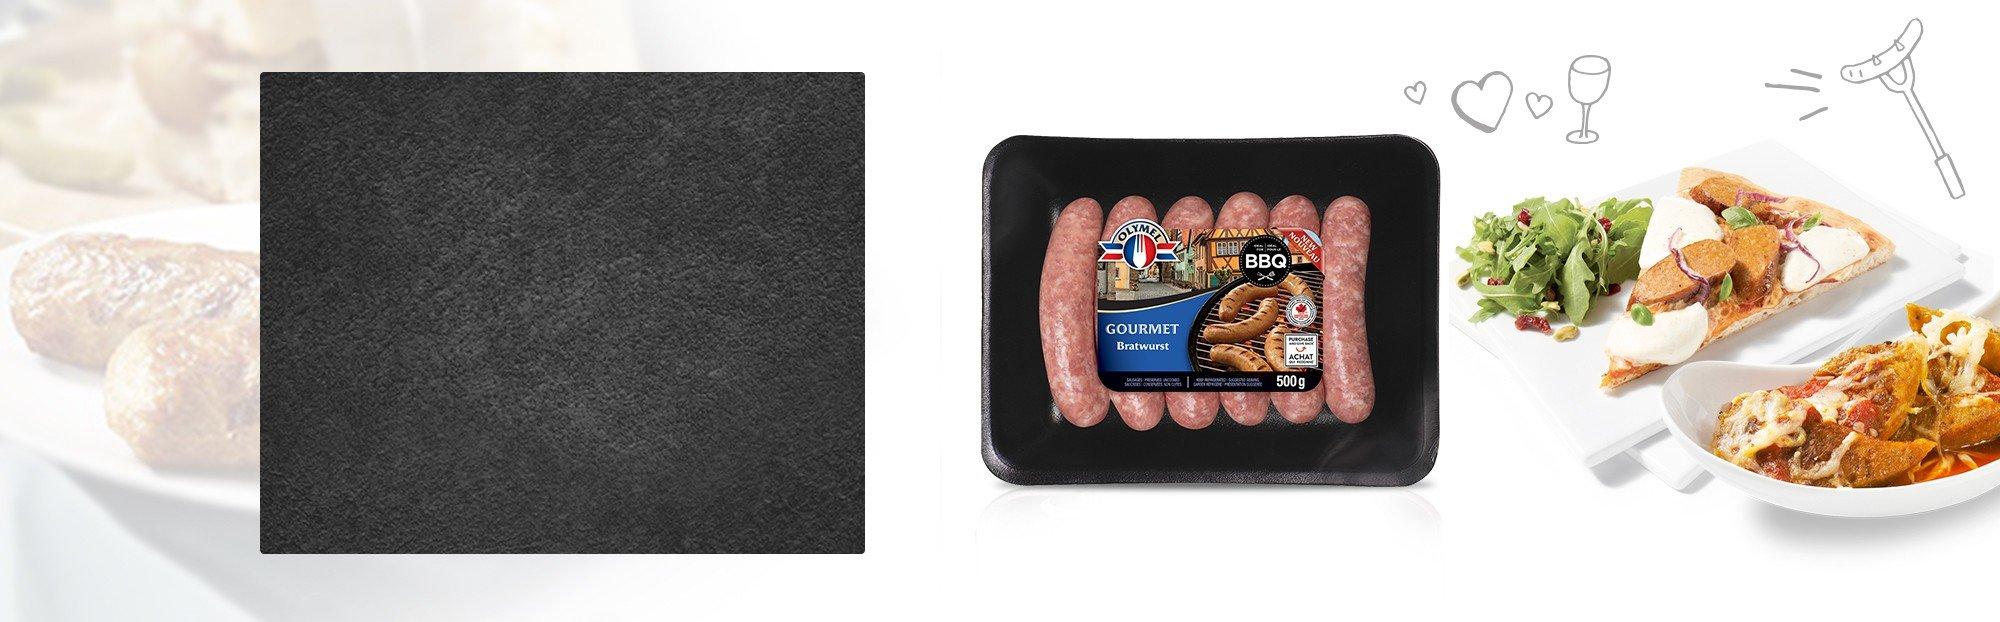 Bratwurst Gourmet